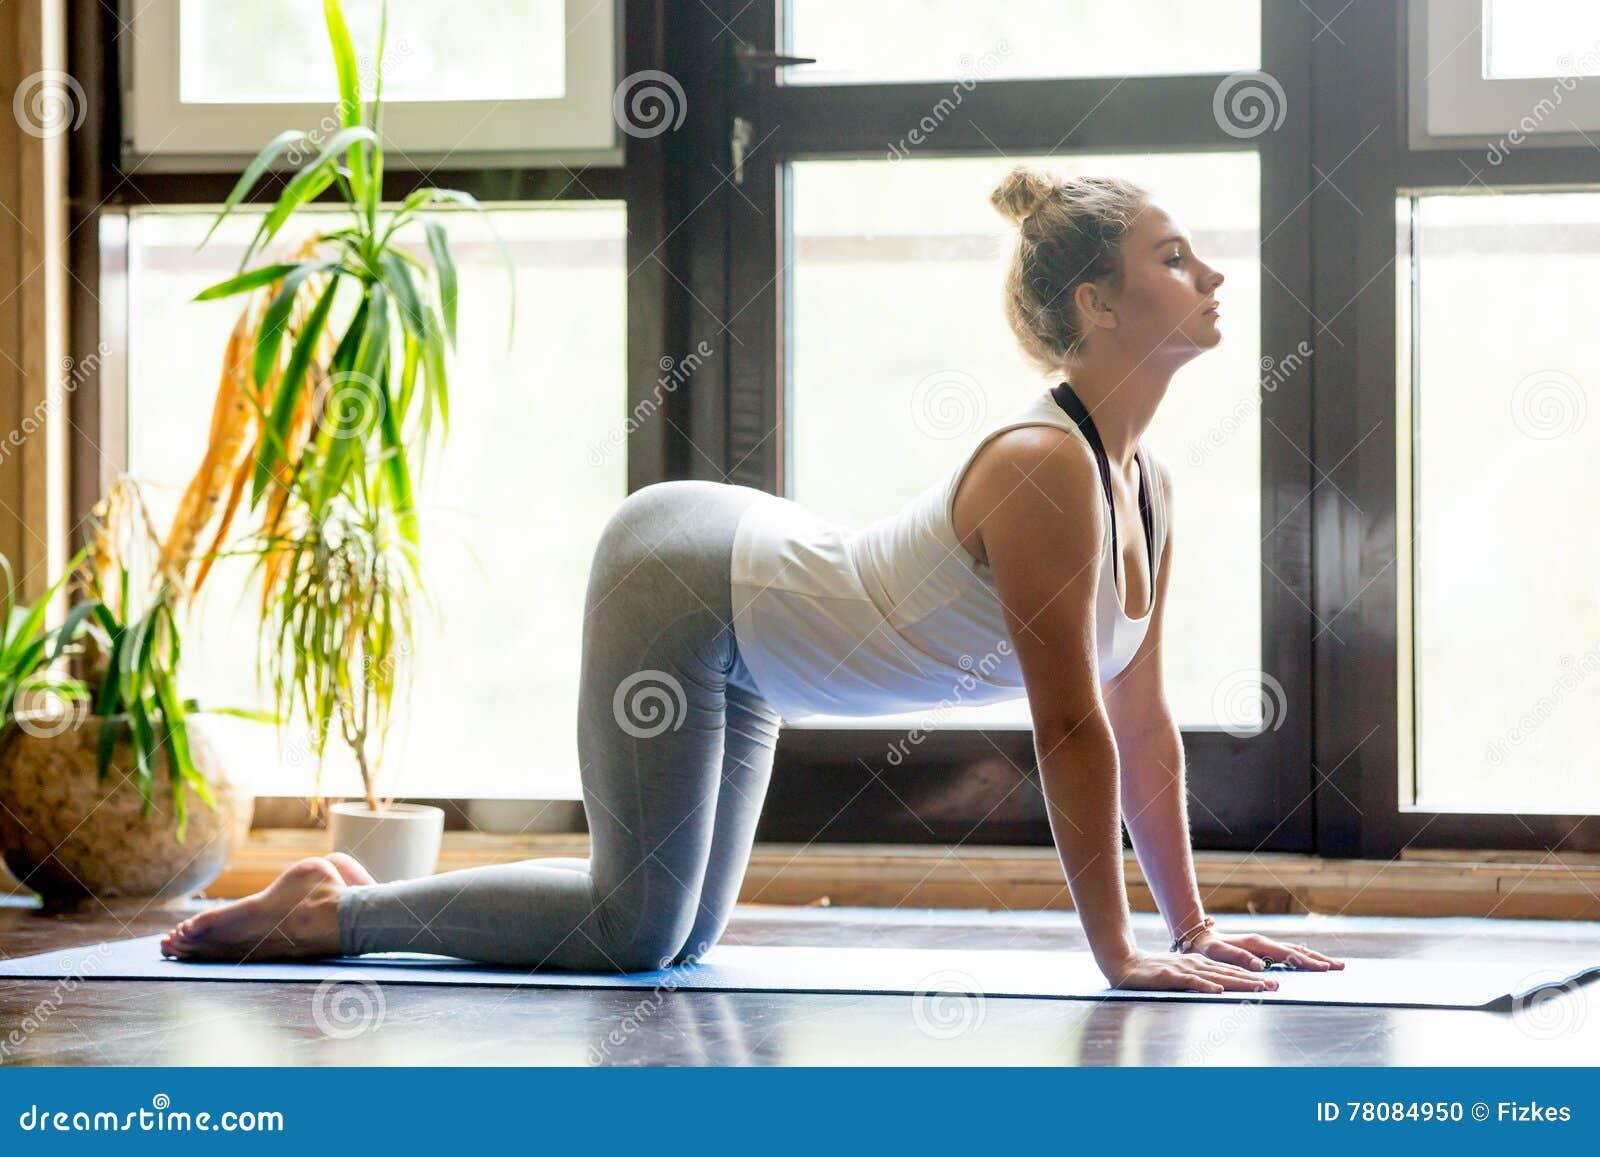 yoga zu hause kuh haltung stockfoto bild von kategorie 78084950. Black Bedroom Furniture Sets. Home Design Ideas